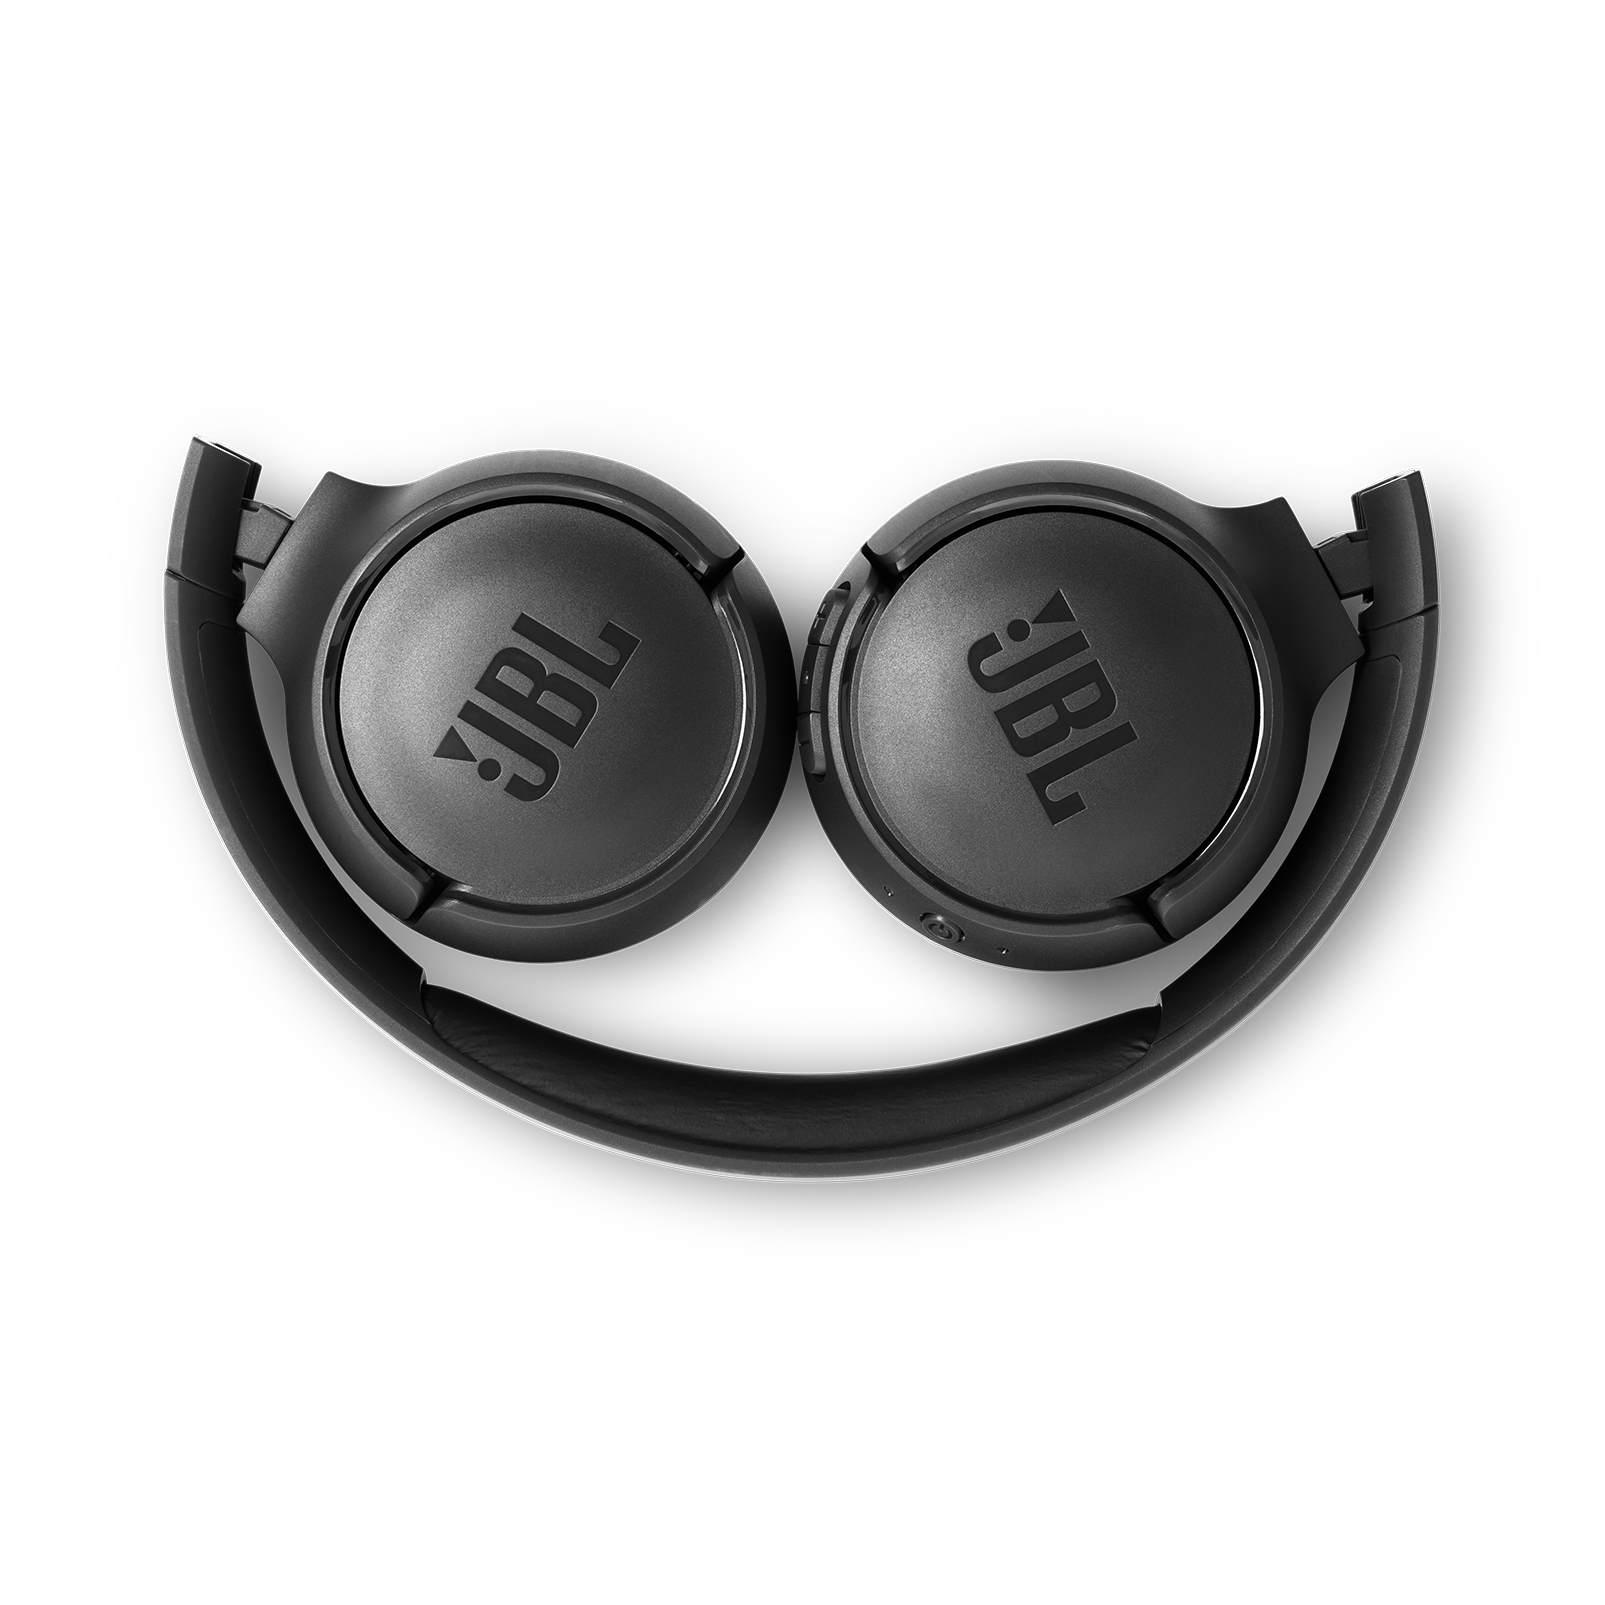 Fone de Ouvido Bluetooth JBL Tune 500BT - Preto JBLT500BTBLK